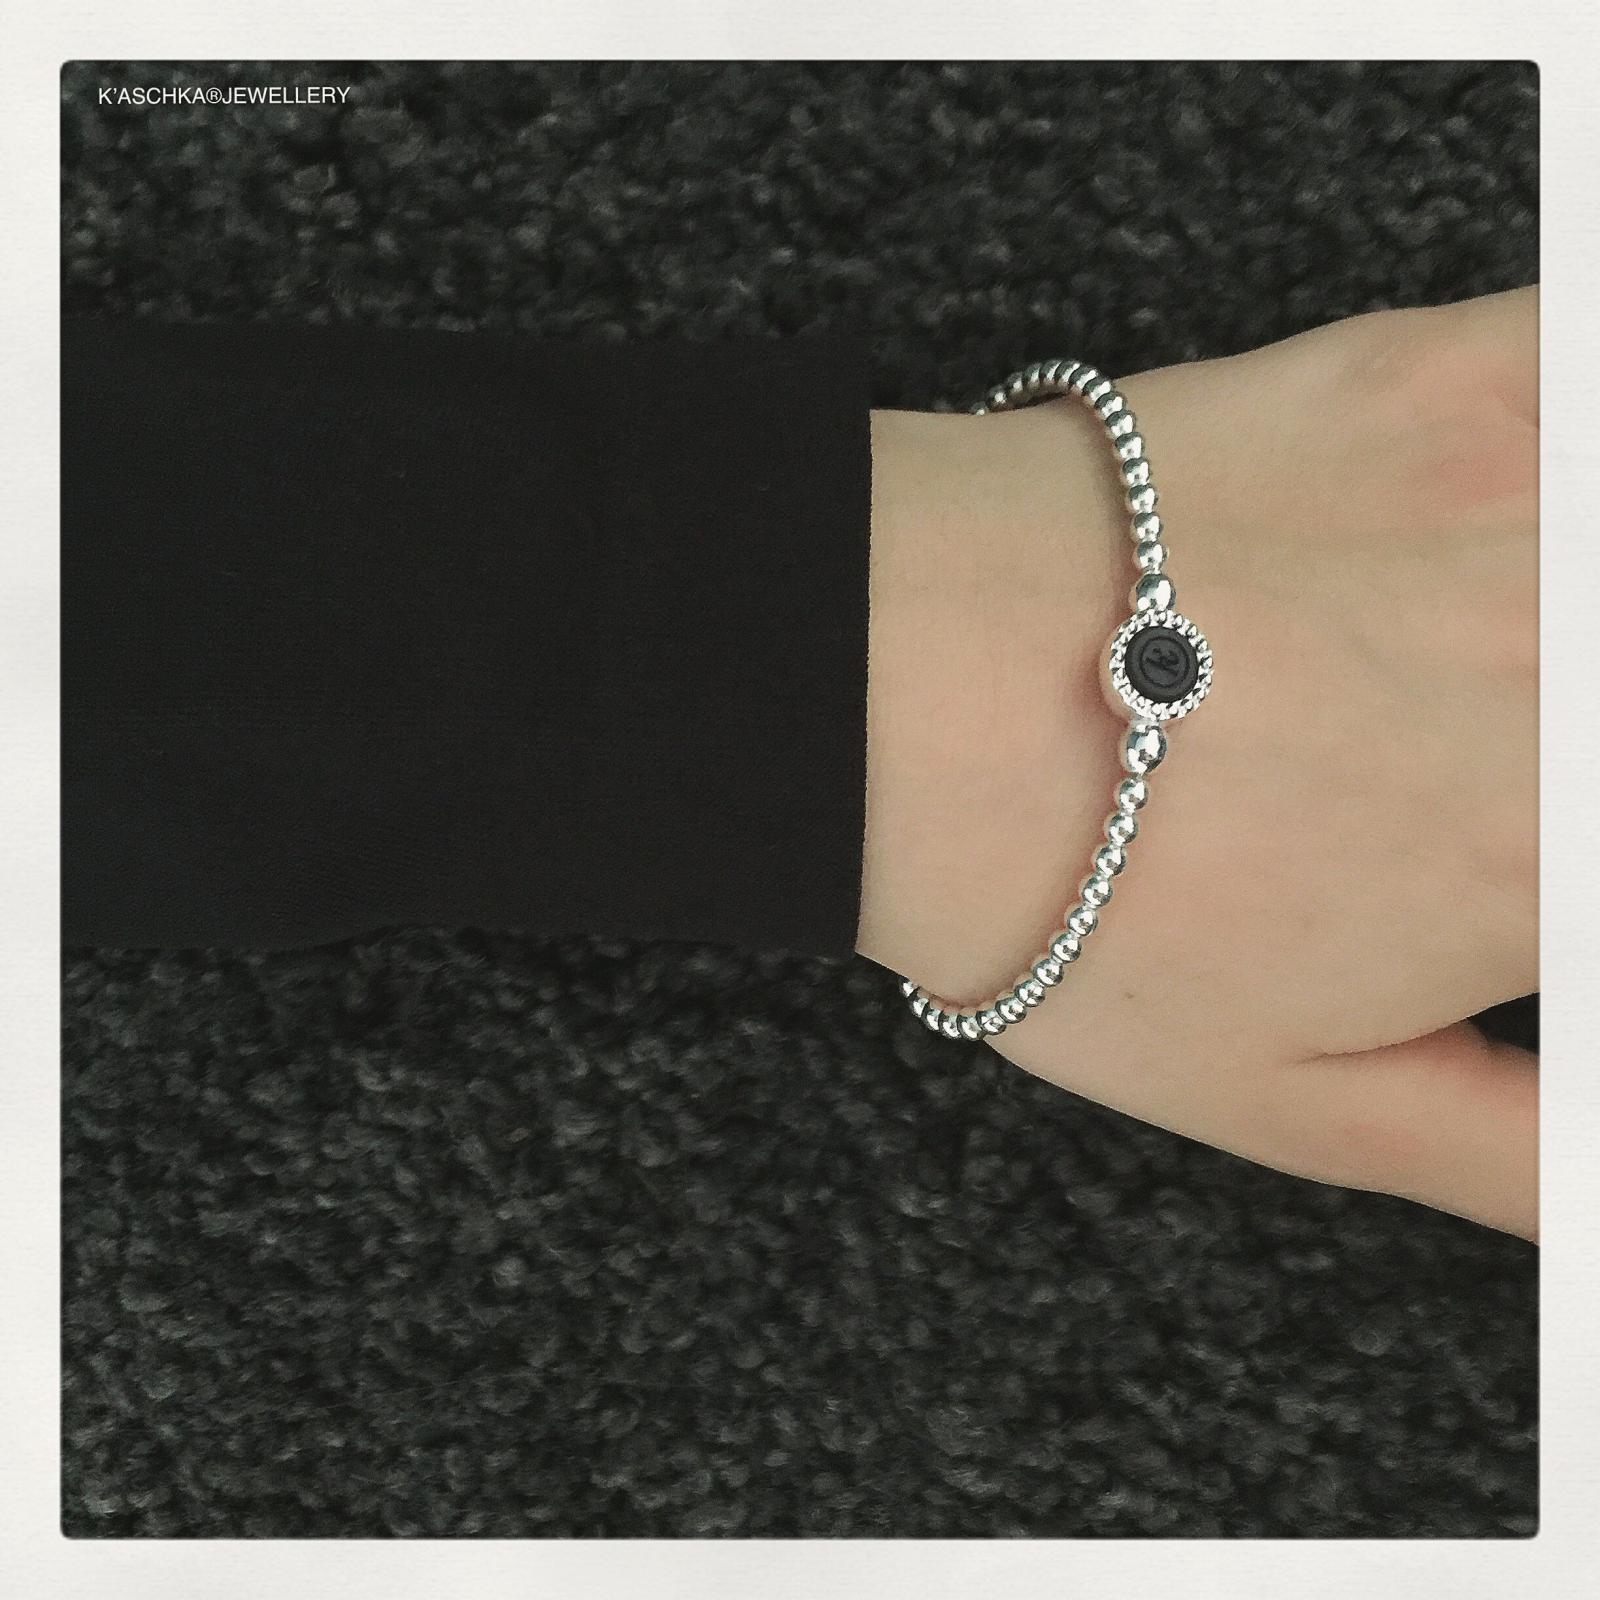 Flexibele 925 sterling zilveren armband ronde kasminis